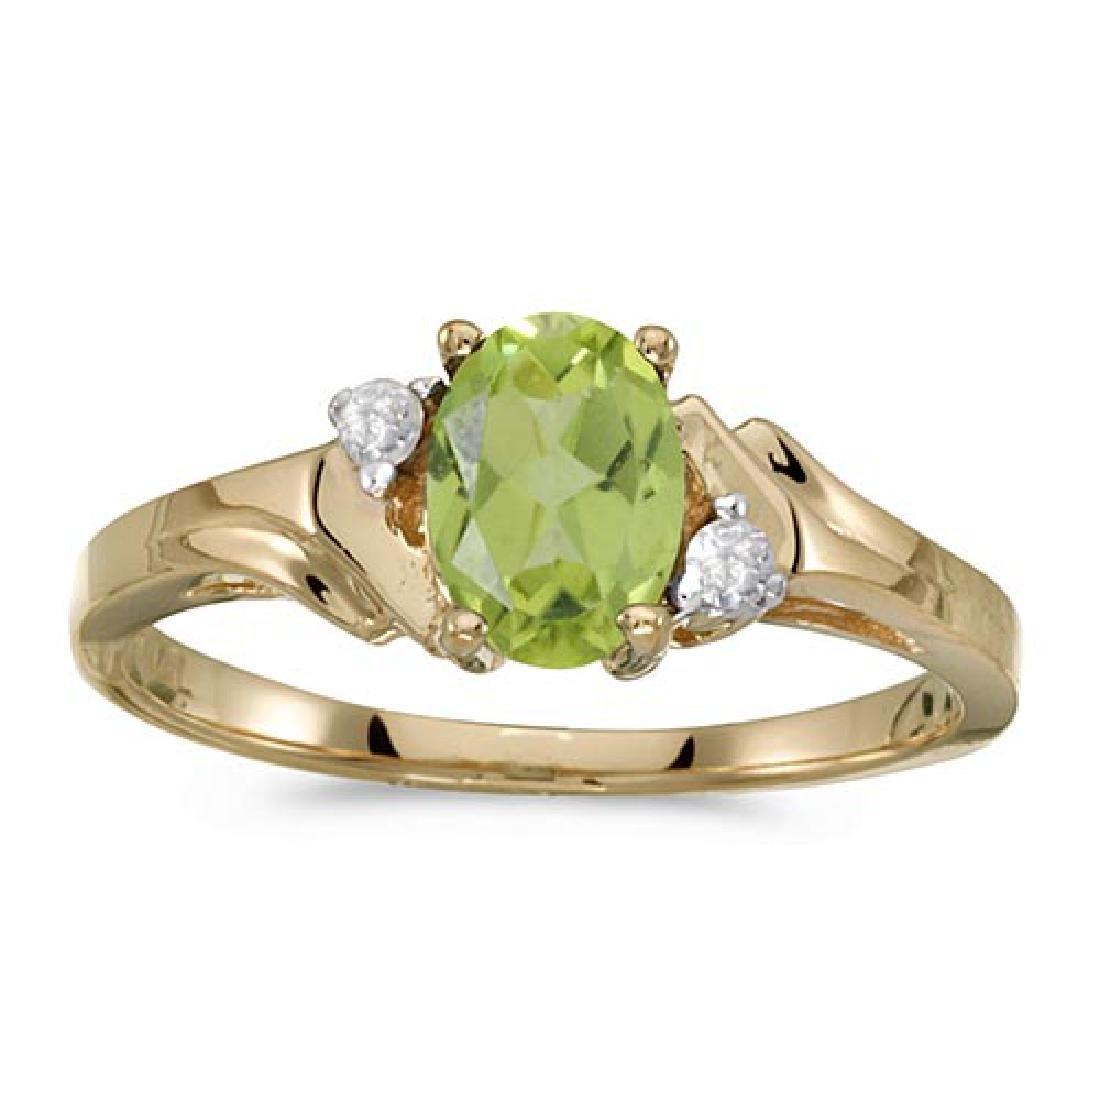 Certified 14k Yellow Gold Oval Peridot And Diamond Ring